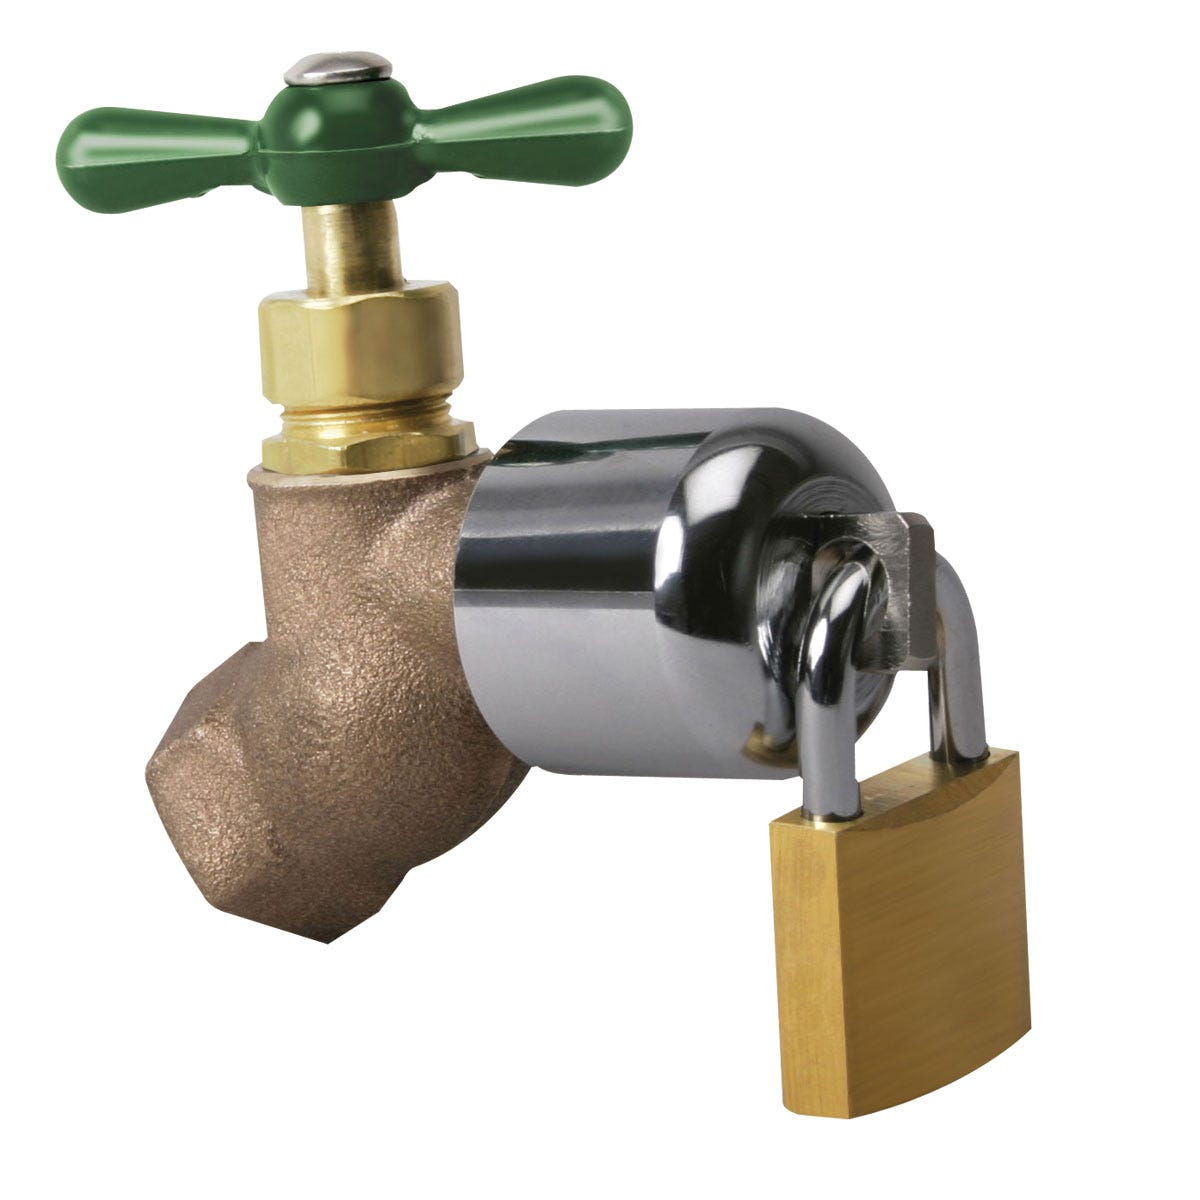 Outdoor Faucet Lock with Padlock